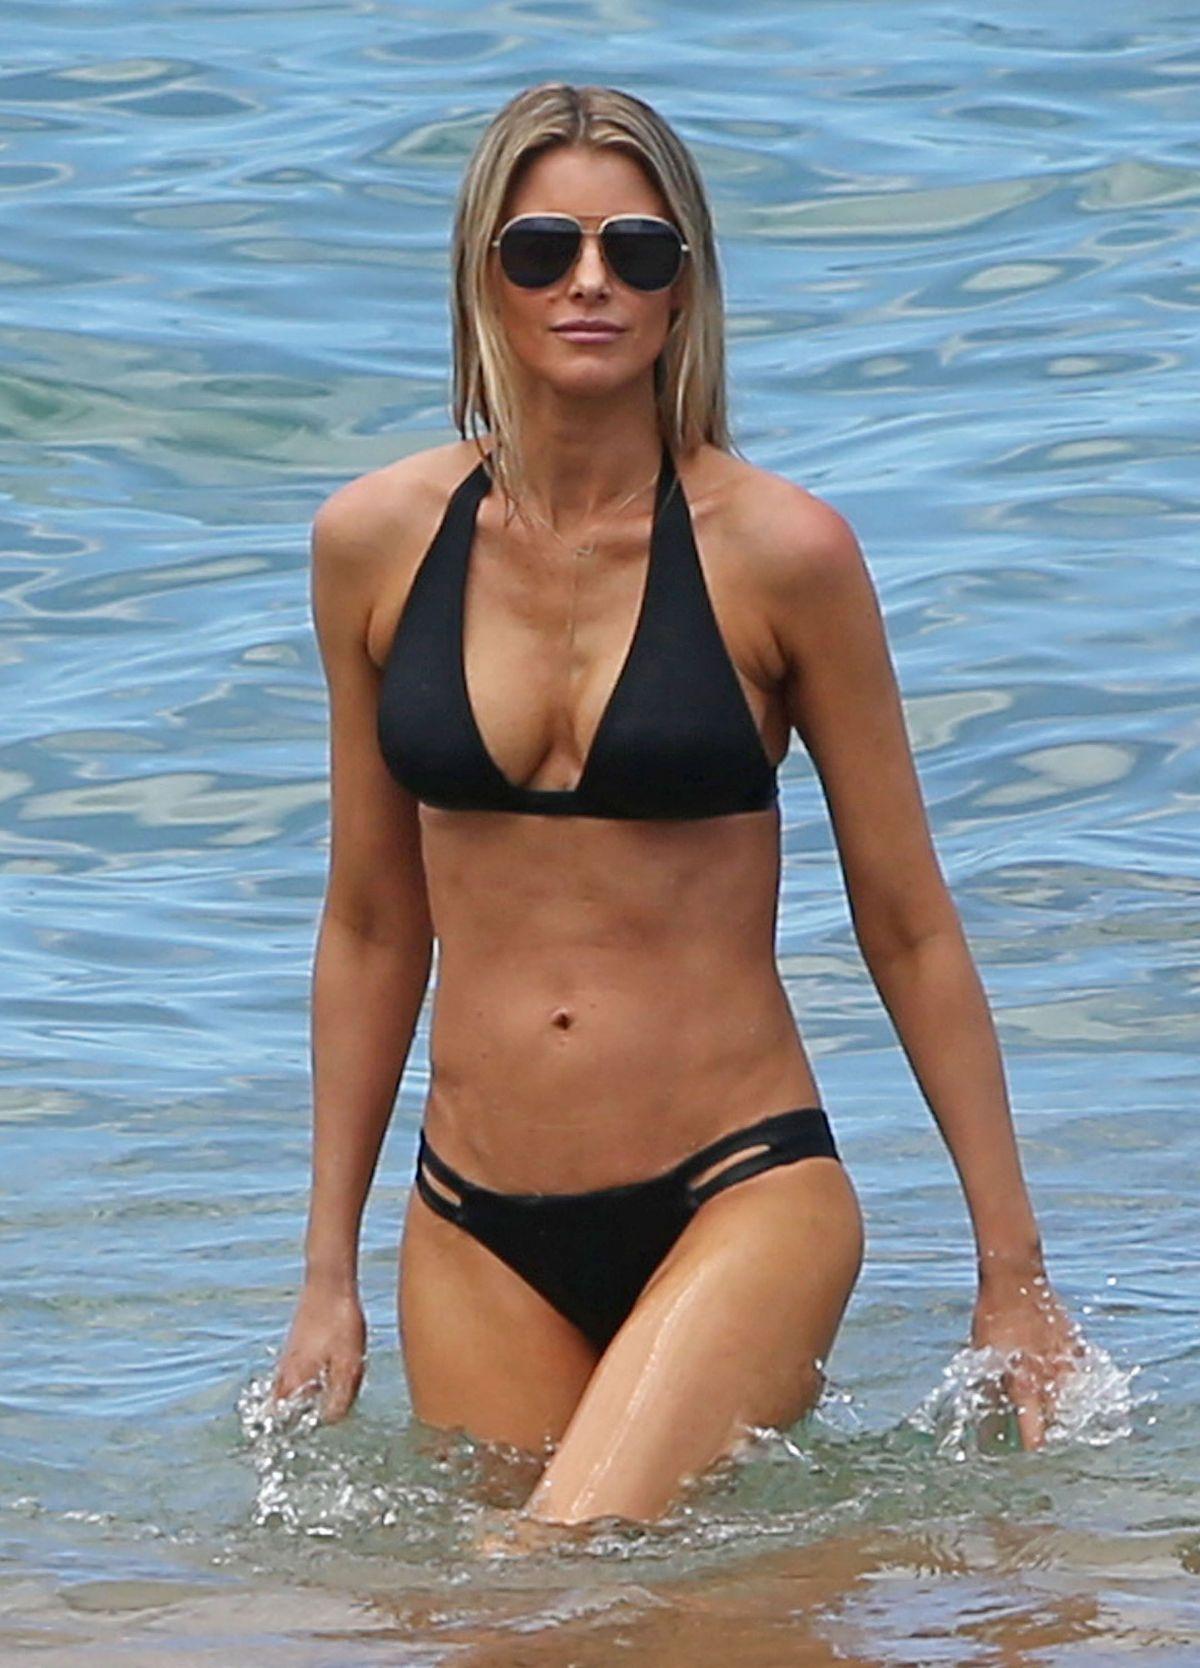 beverly paige bikini